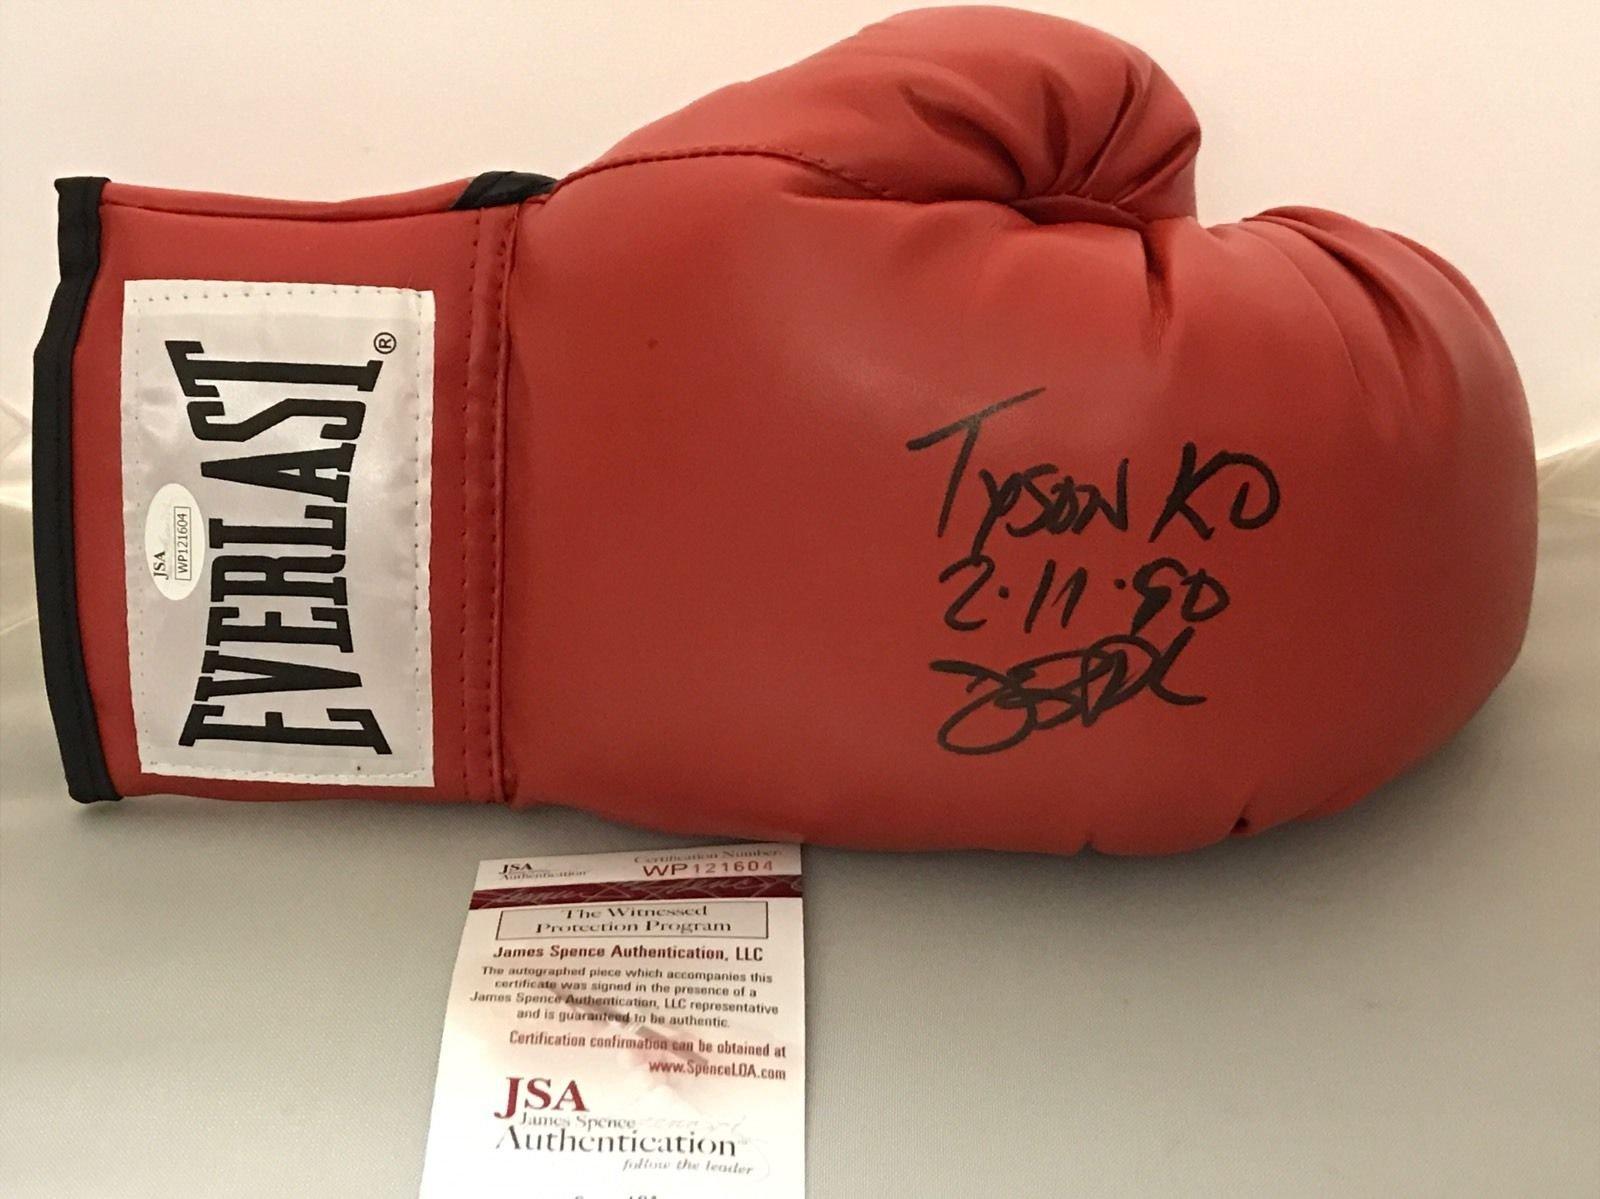 "Autographed/Signed James Buster Douglas""Tyson KO 2 11 90"" Red Everlast Boxing Glove JSA COA"